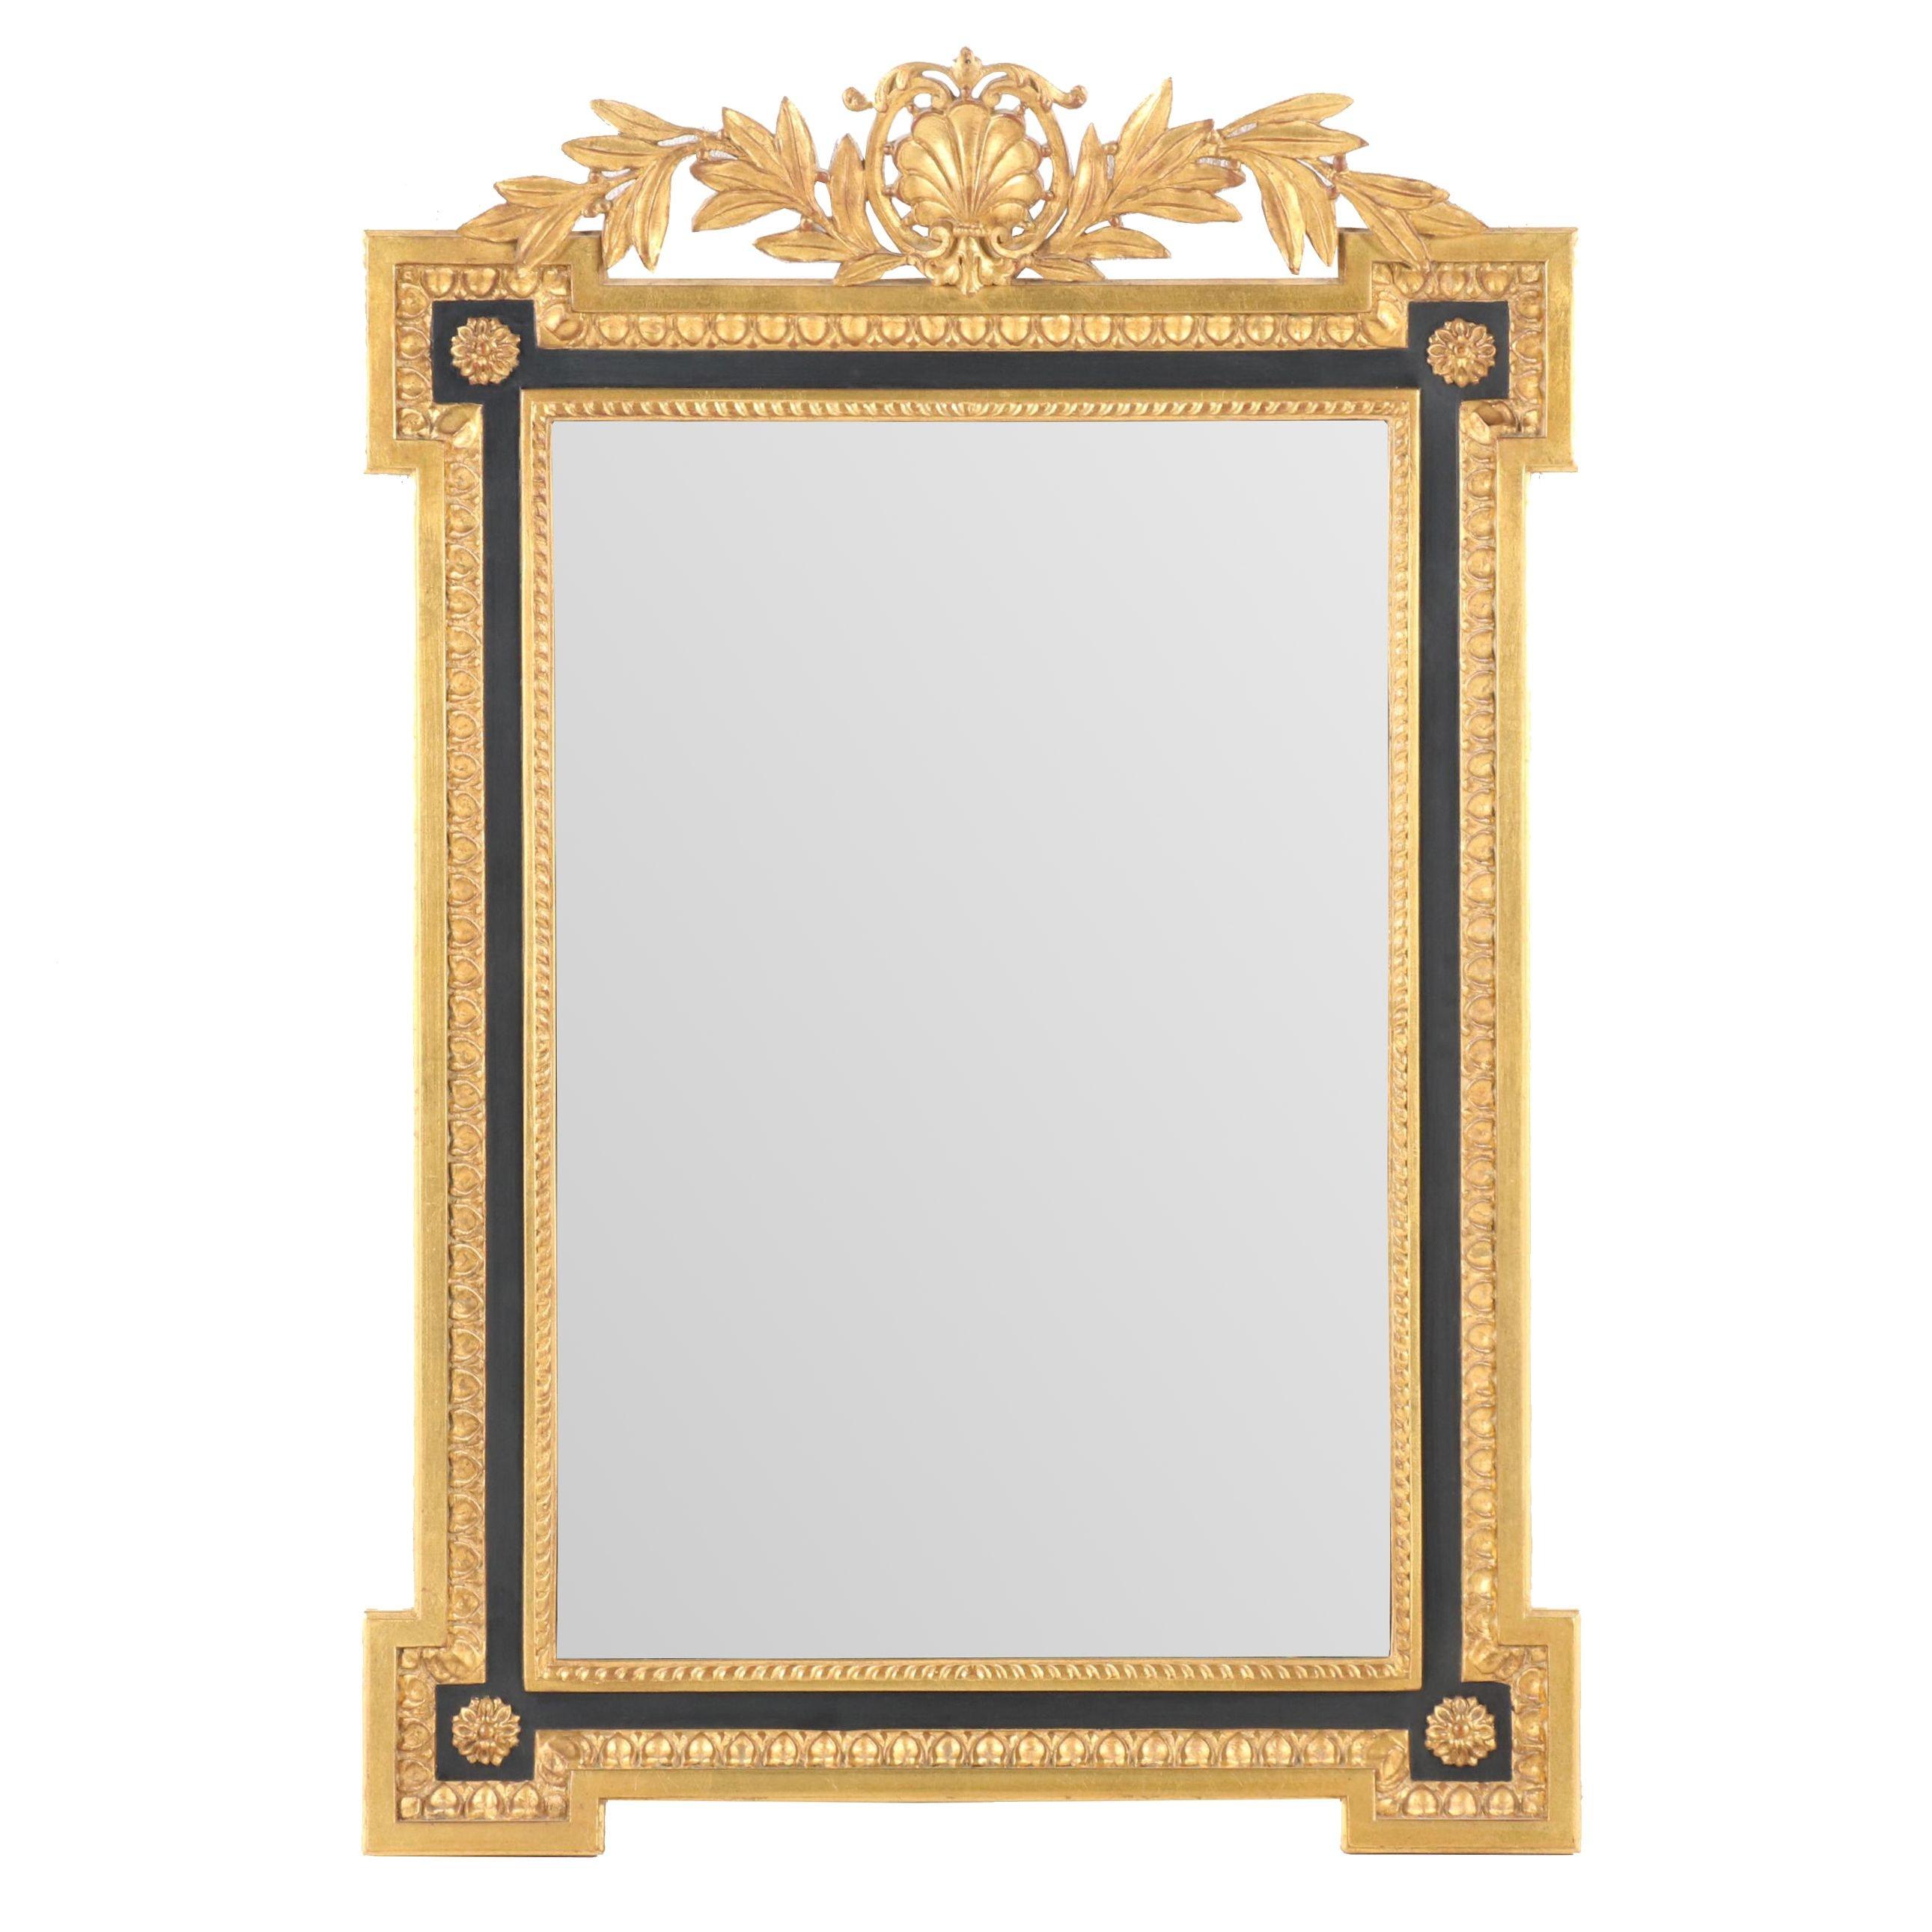 Carvers' Guild Gilt Regency Style Wall Mirror